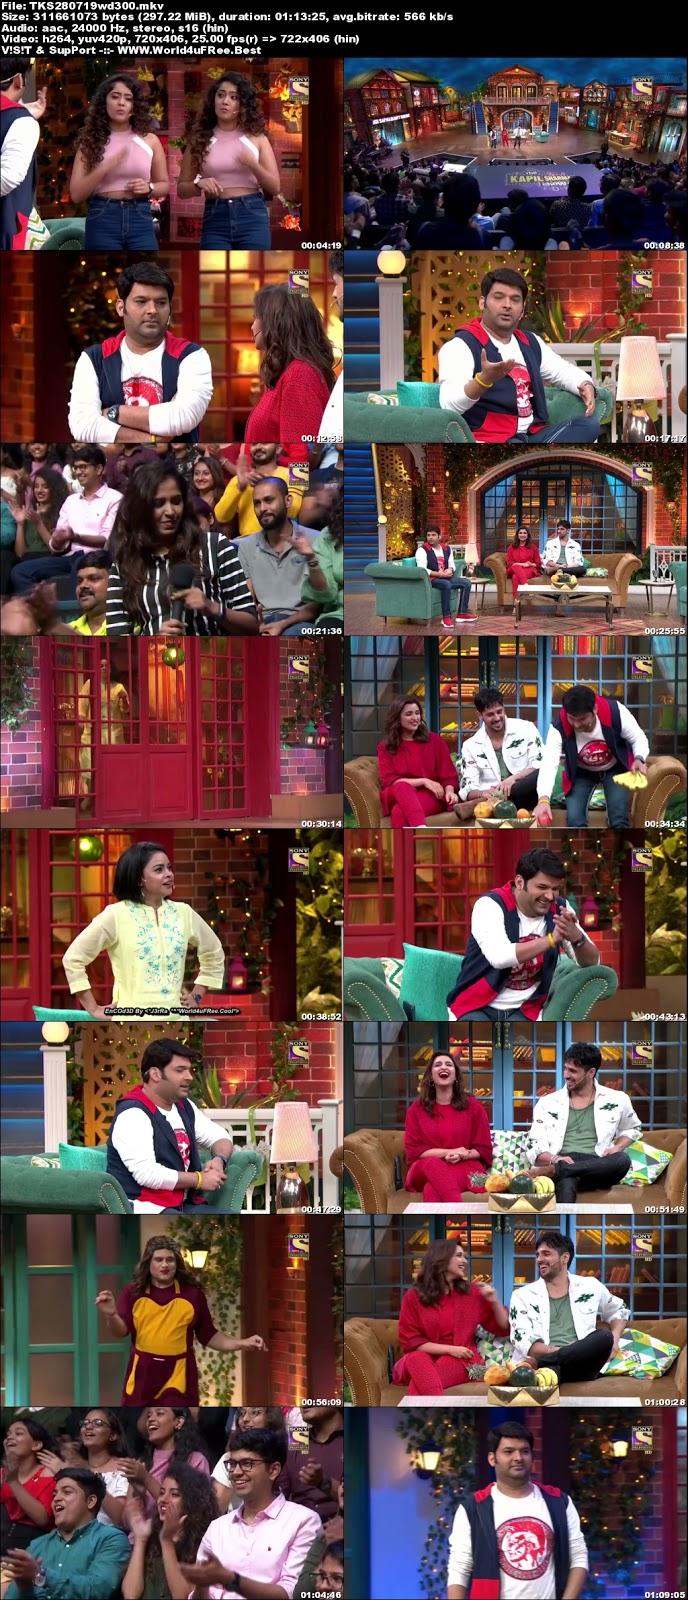 Kapil Sharma Show Season 1 Episode 56 Gastronomia Y Viajes